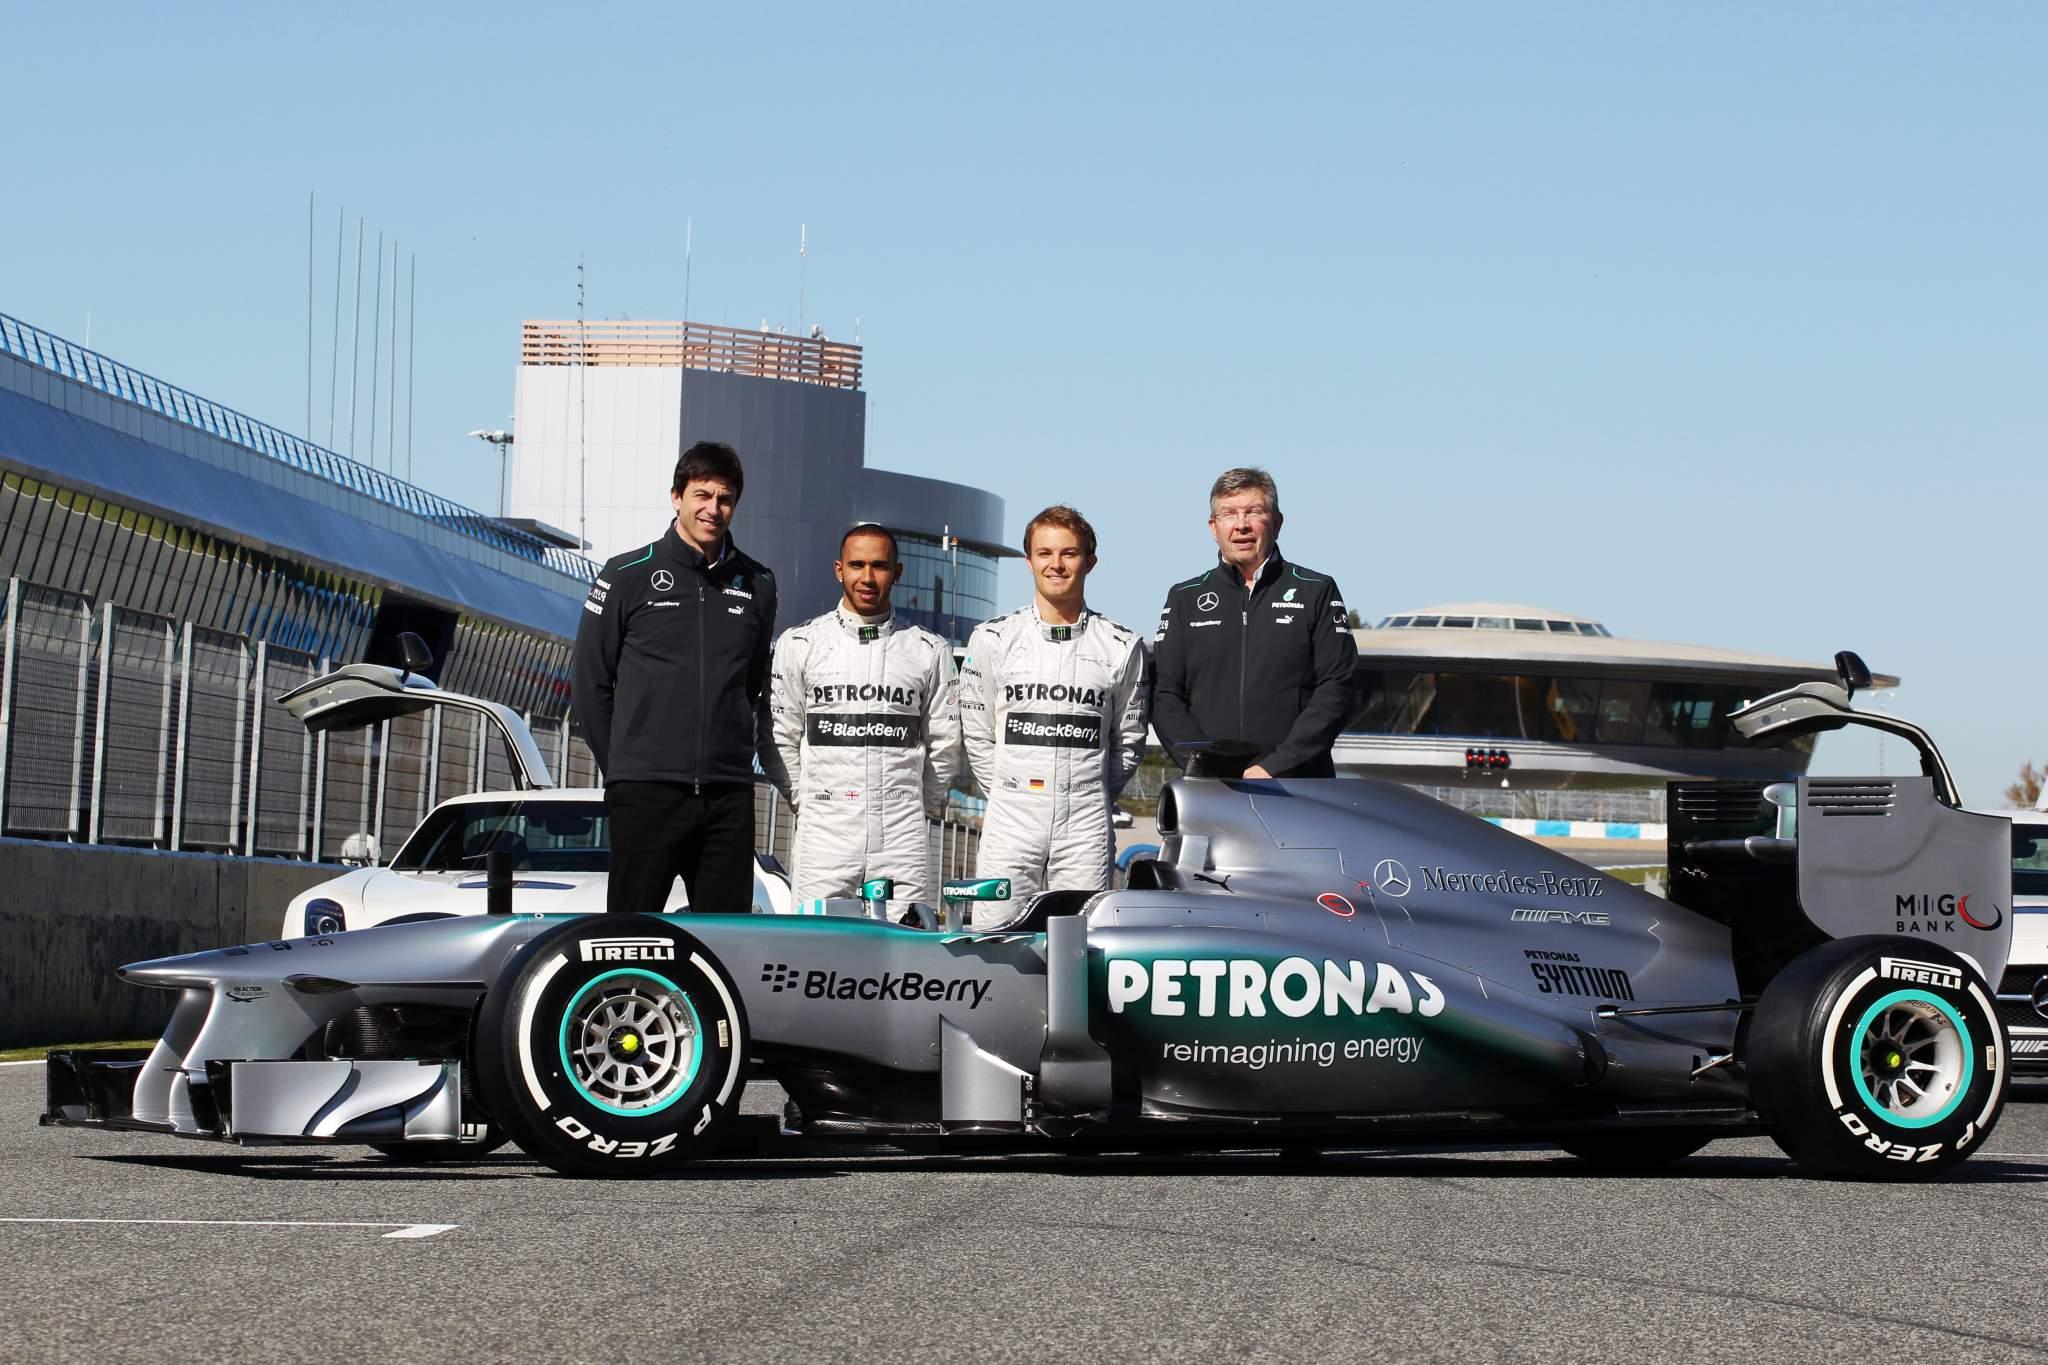 2013 Mercedes F1 launch